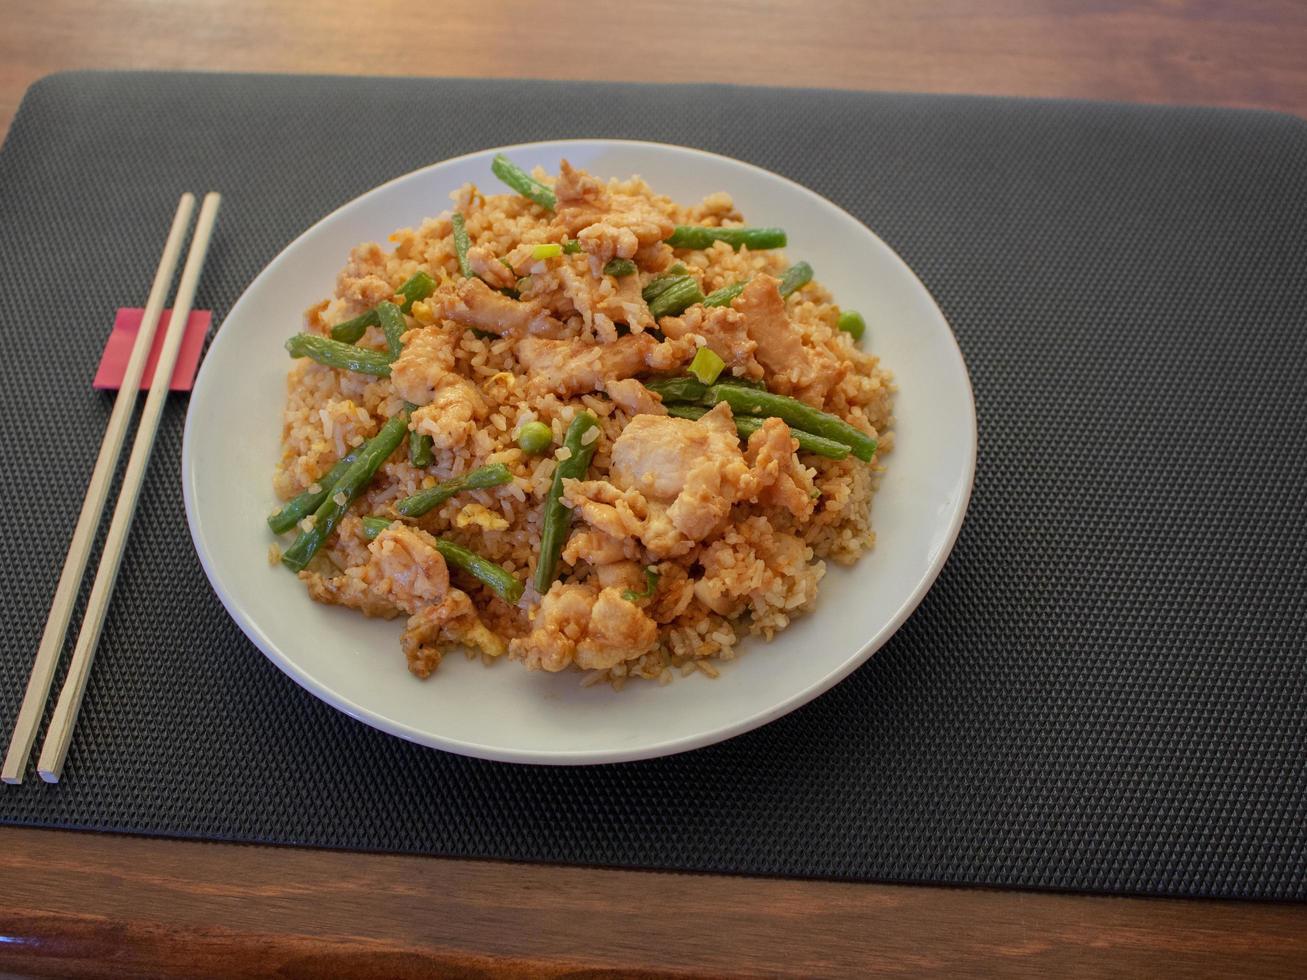 kip gebakken rijst foto